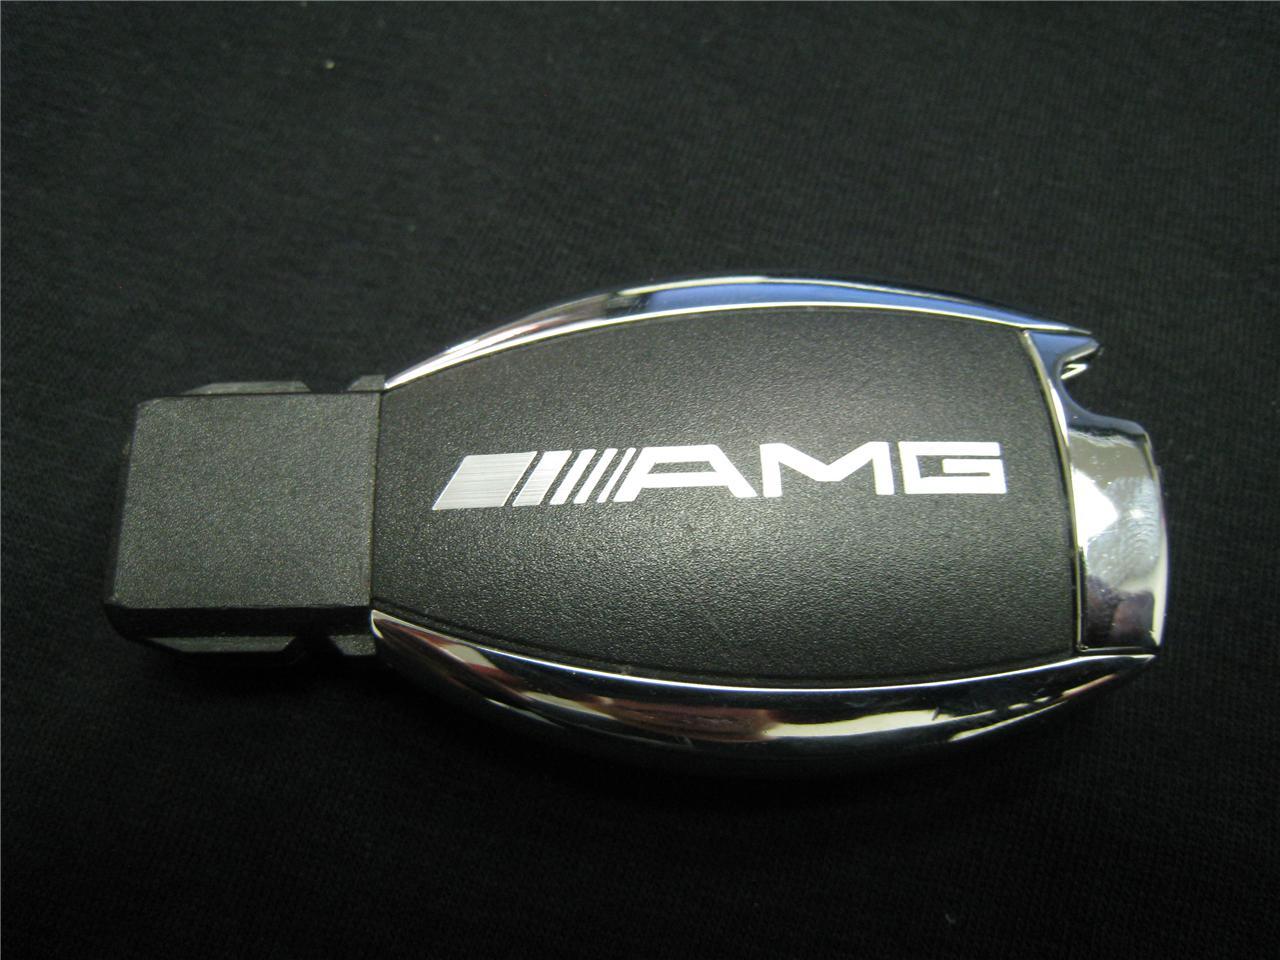 2pcs amg decal sticker mercedes benz car key ebay for Key mercedes benz